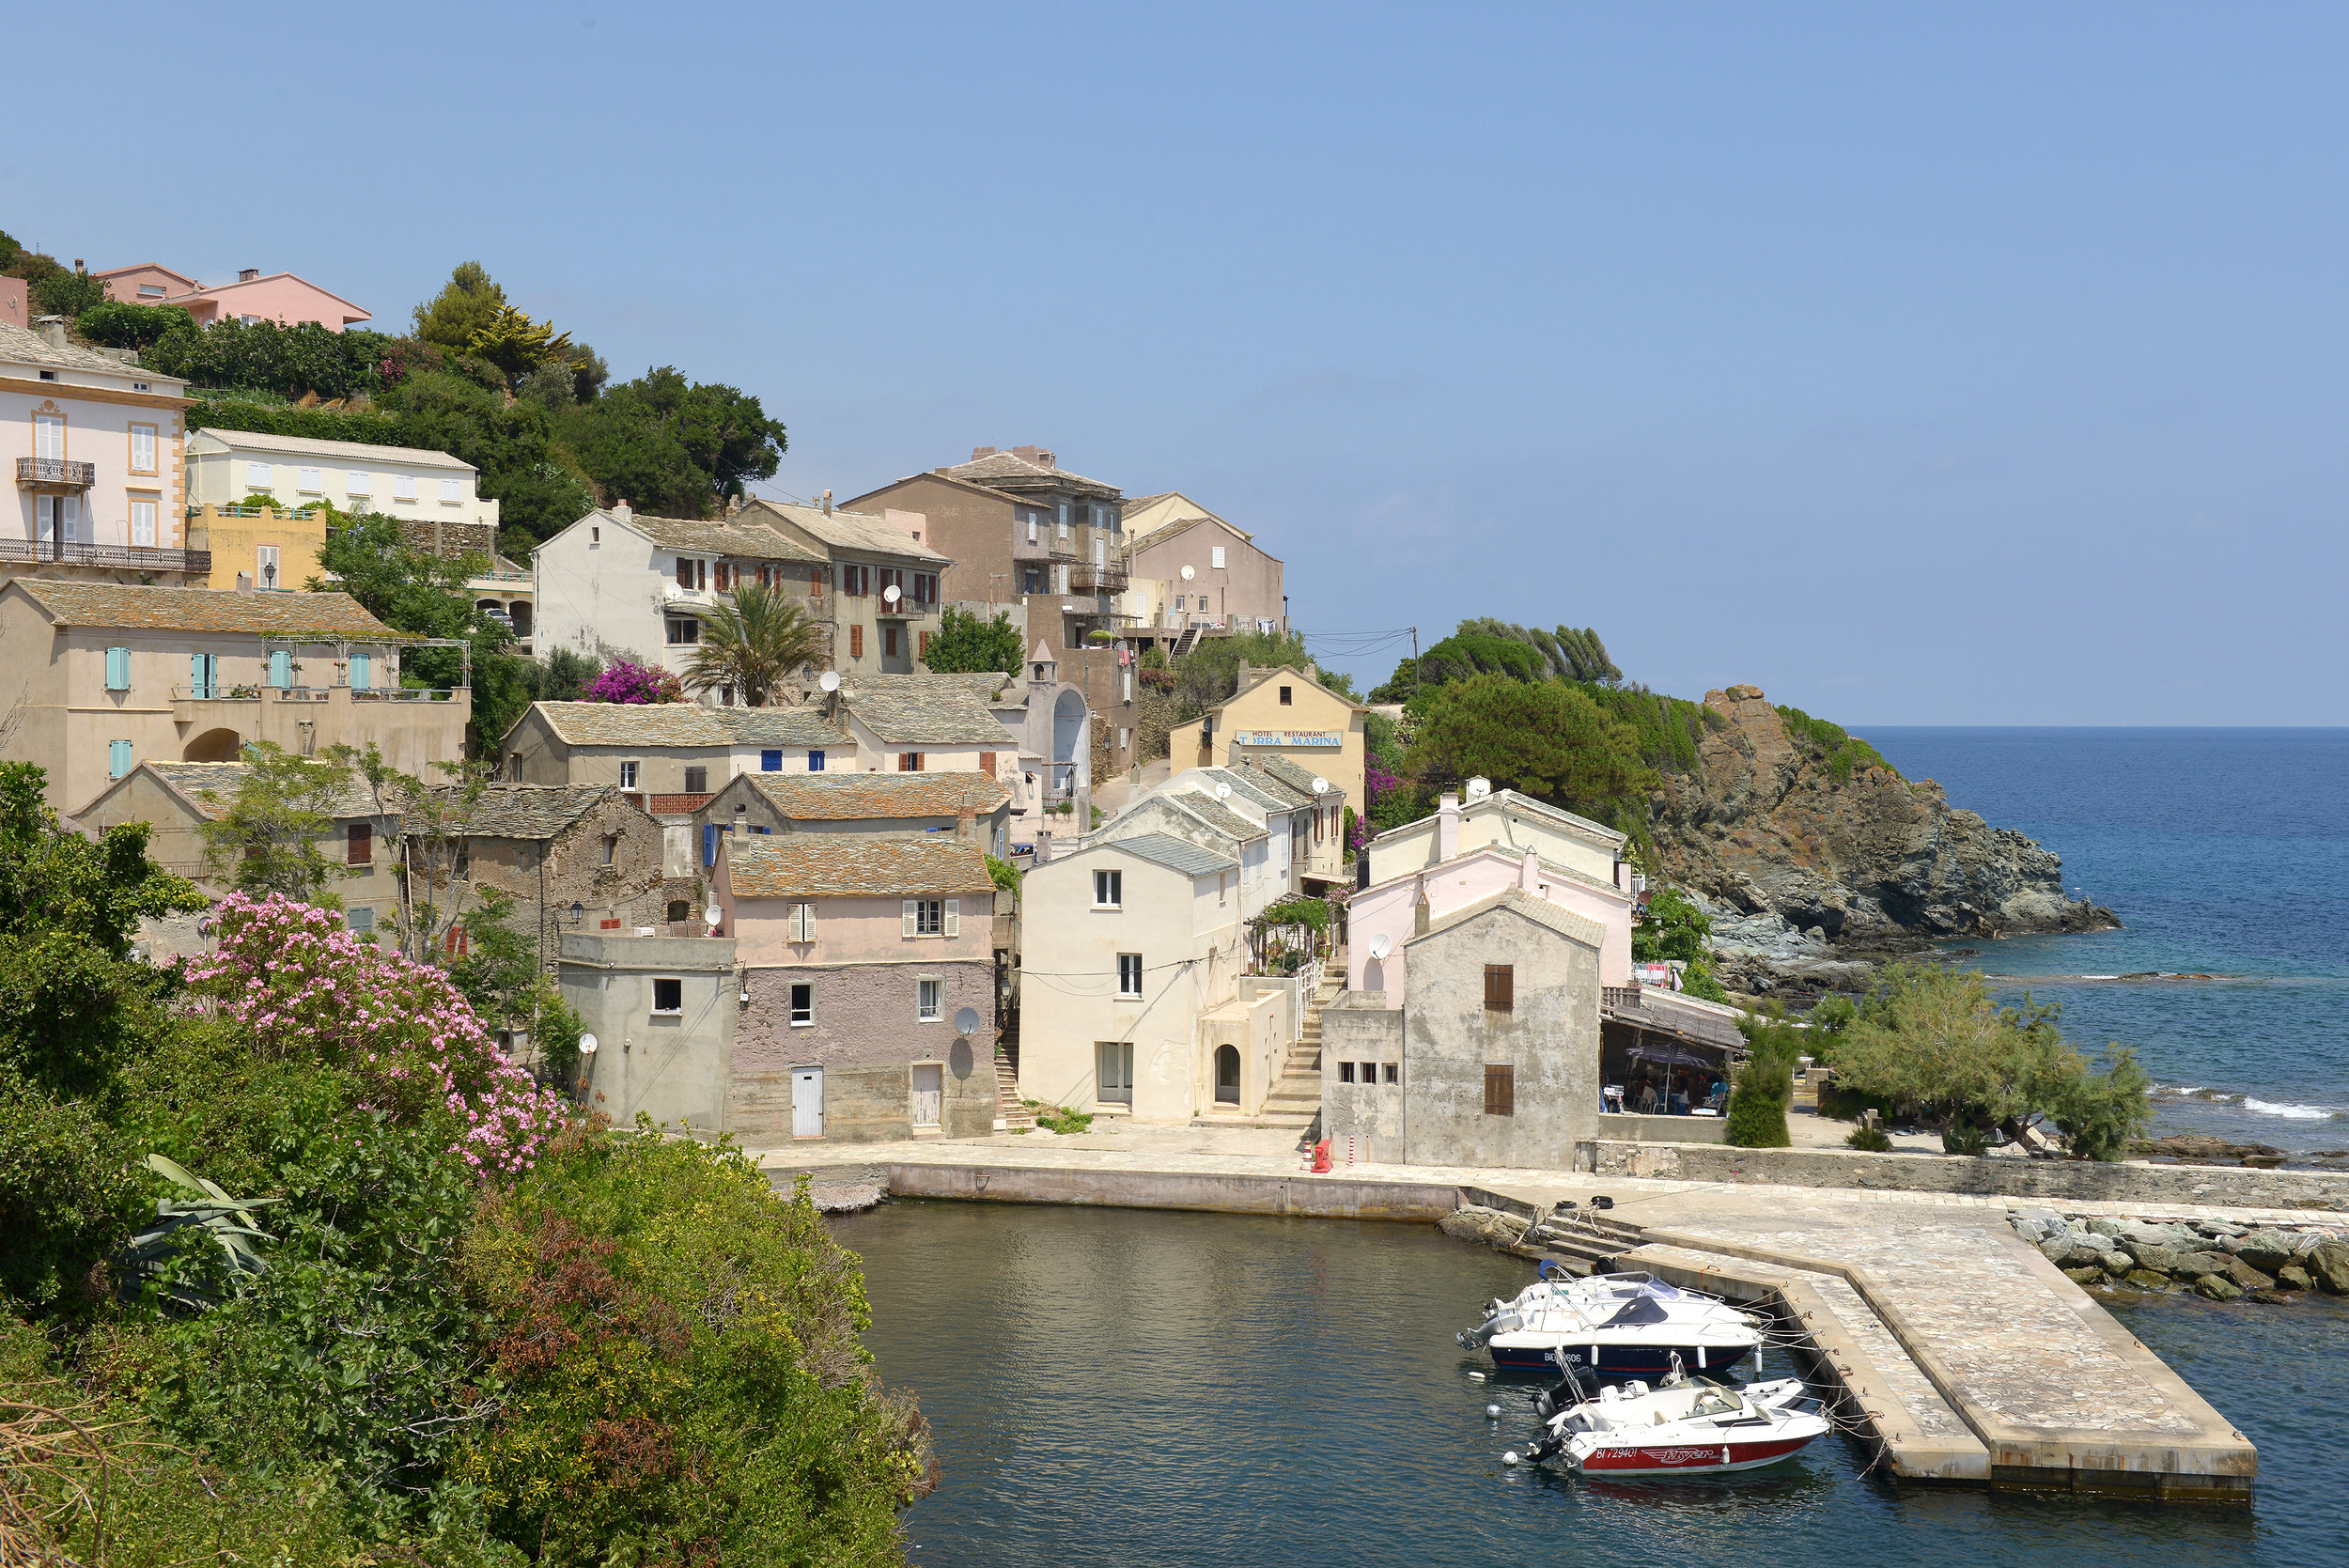 Ranska, Korsika, kylä, loma, matka, matkablogi